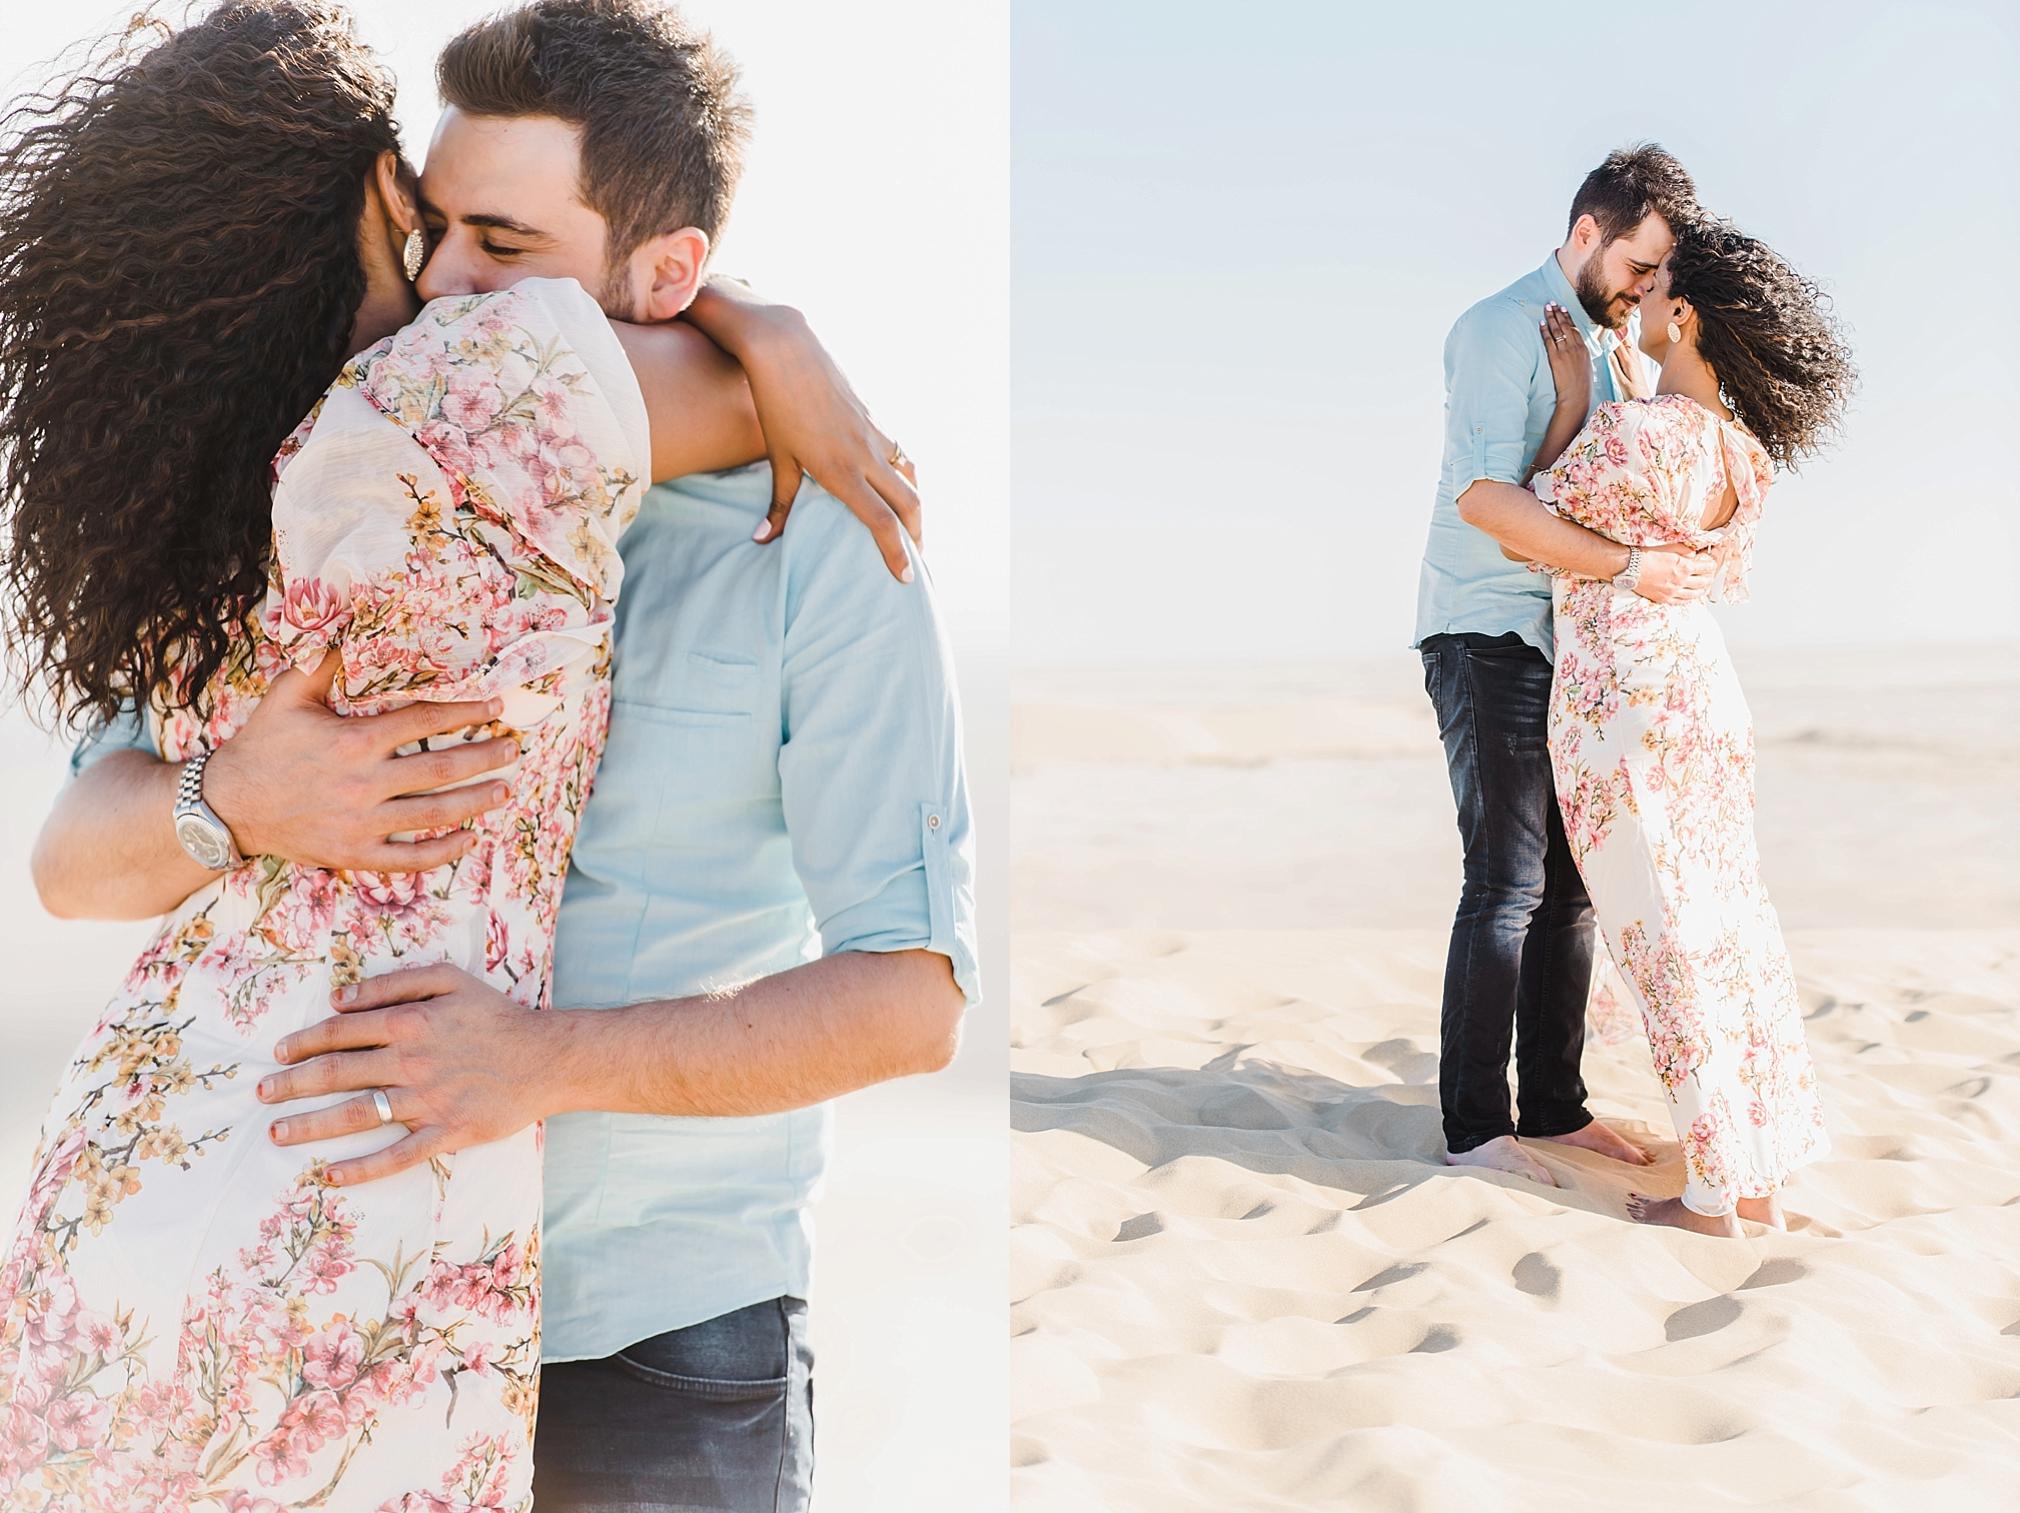 Singing Sand Dunes Desert Love Shoot   Ali and Batoul Photography_0013.jpg